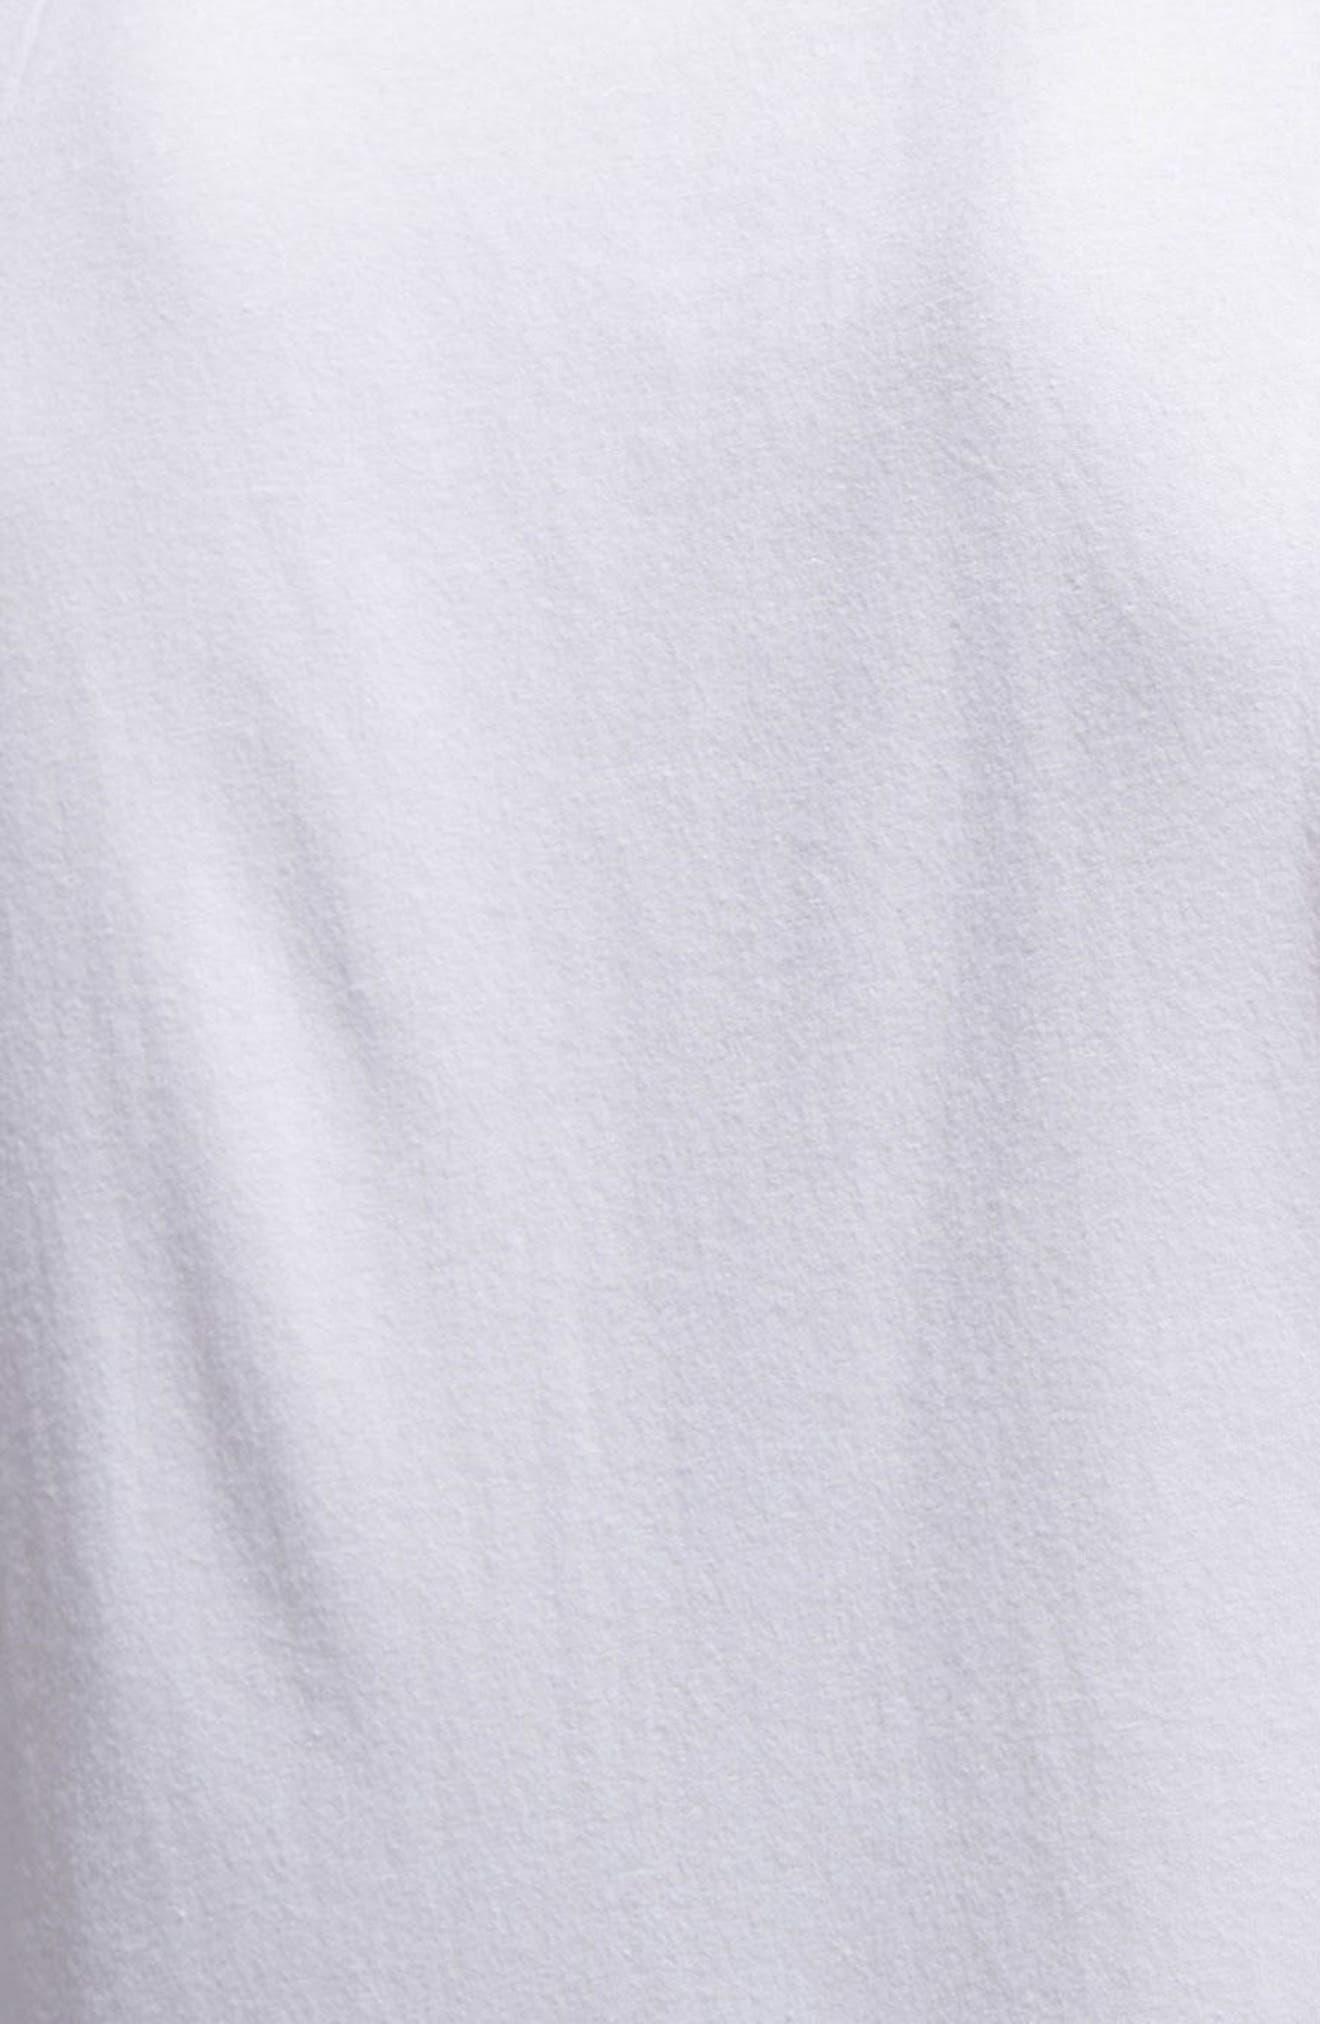 Slim Fit Heathered Logo Tank,                             Alternate thumbnail 5, color,                             White/Collegiate Navy